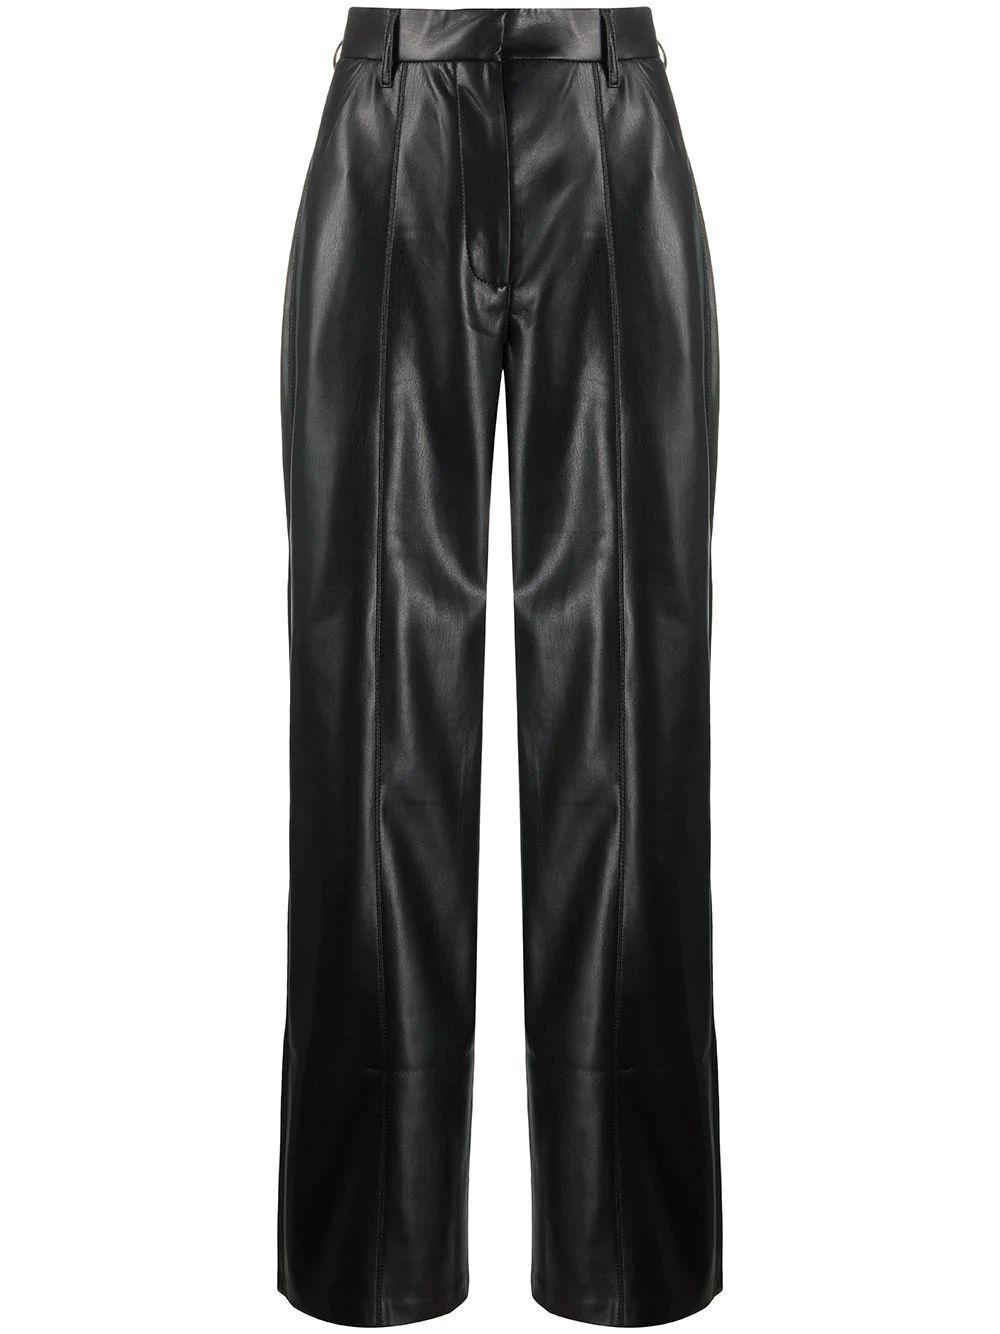 Cleo Vegan Leather Straight Leg Pant Item # FWPA05499